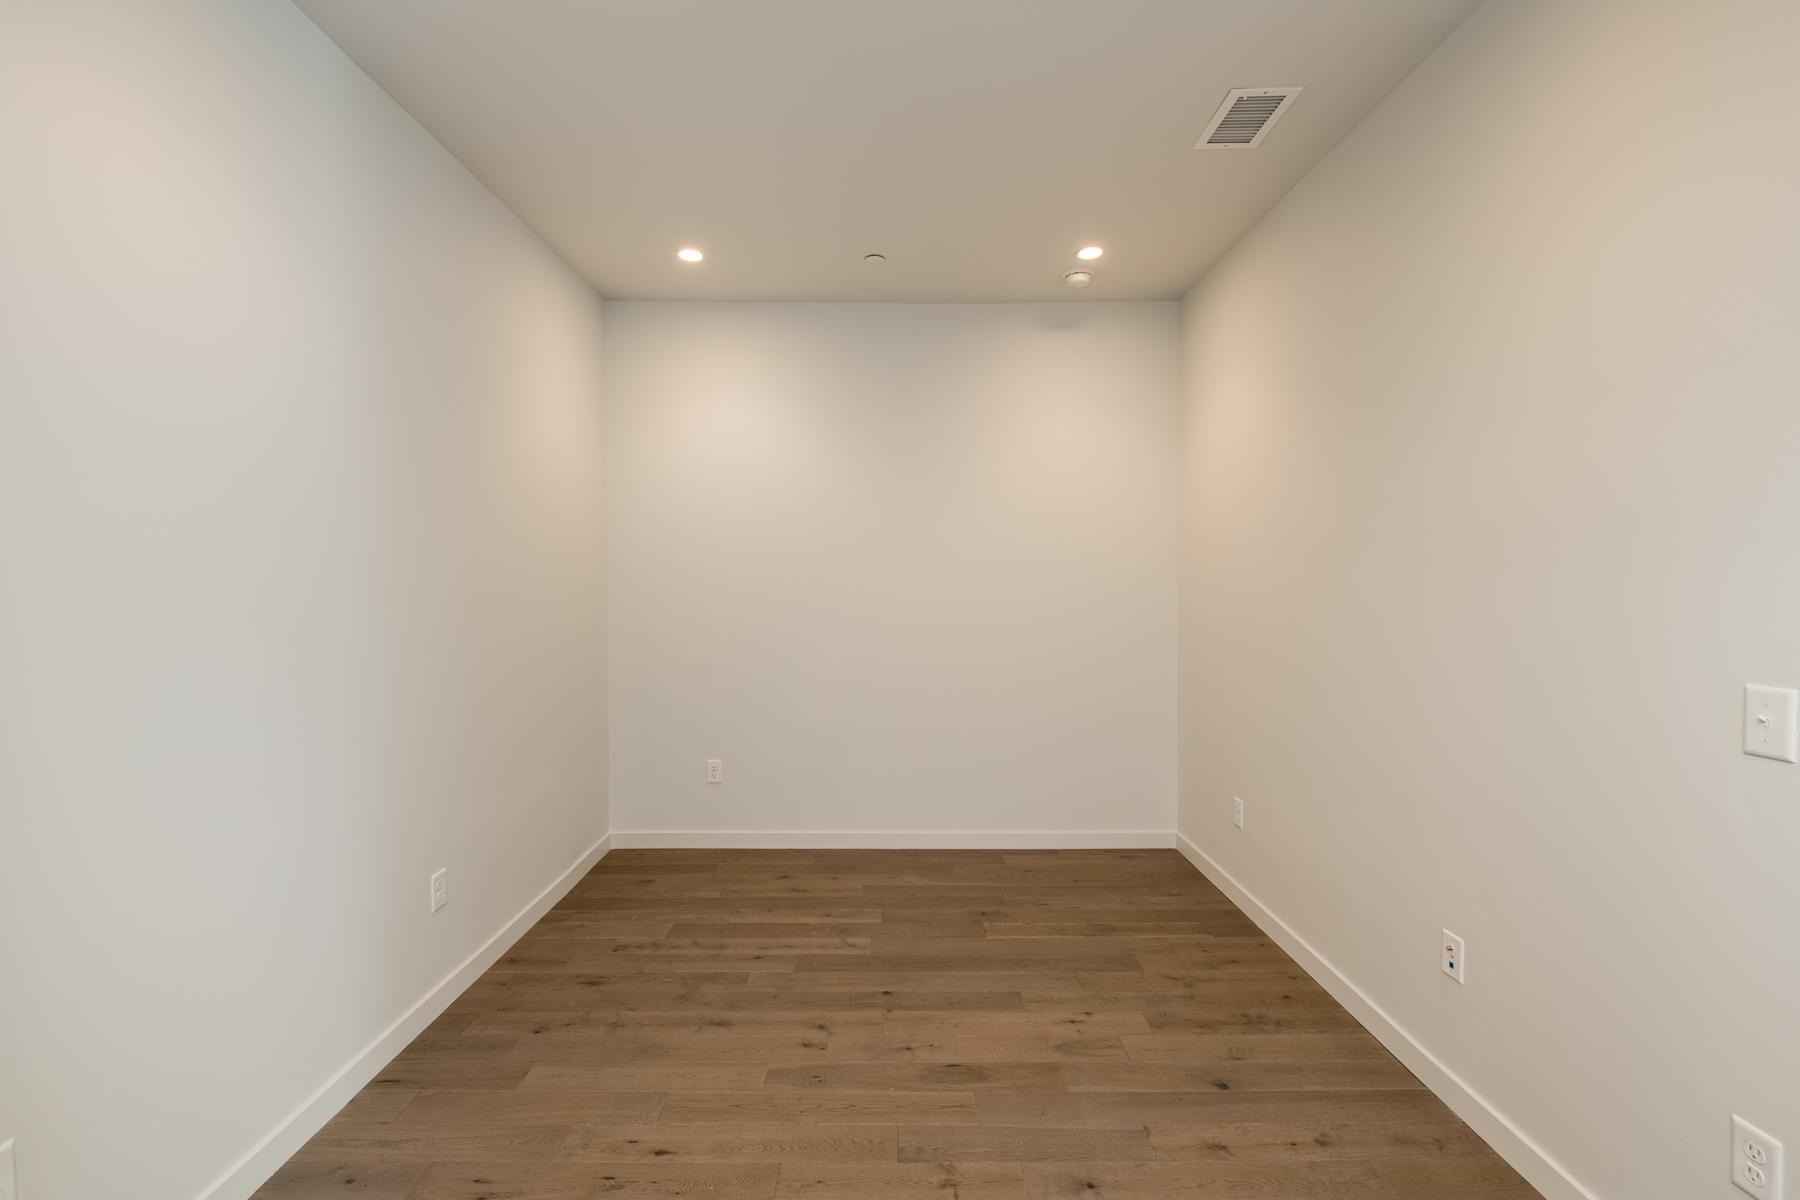 Additional photo for property listing at Ogden Flats 1300 North Ogden Street #305 Denver, Colorado 80218 Estados Unidos